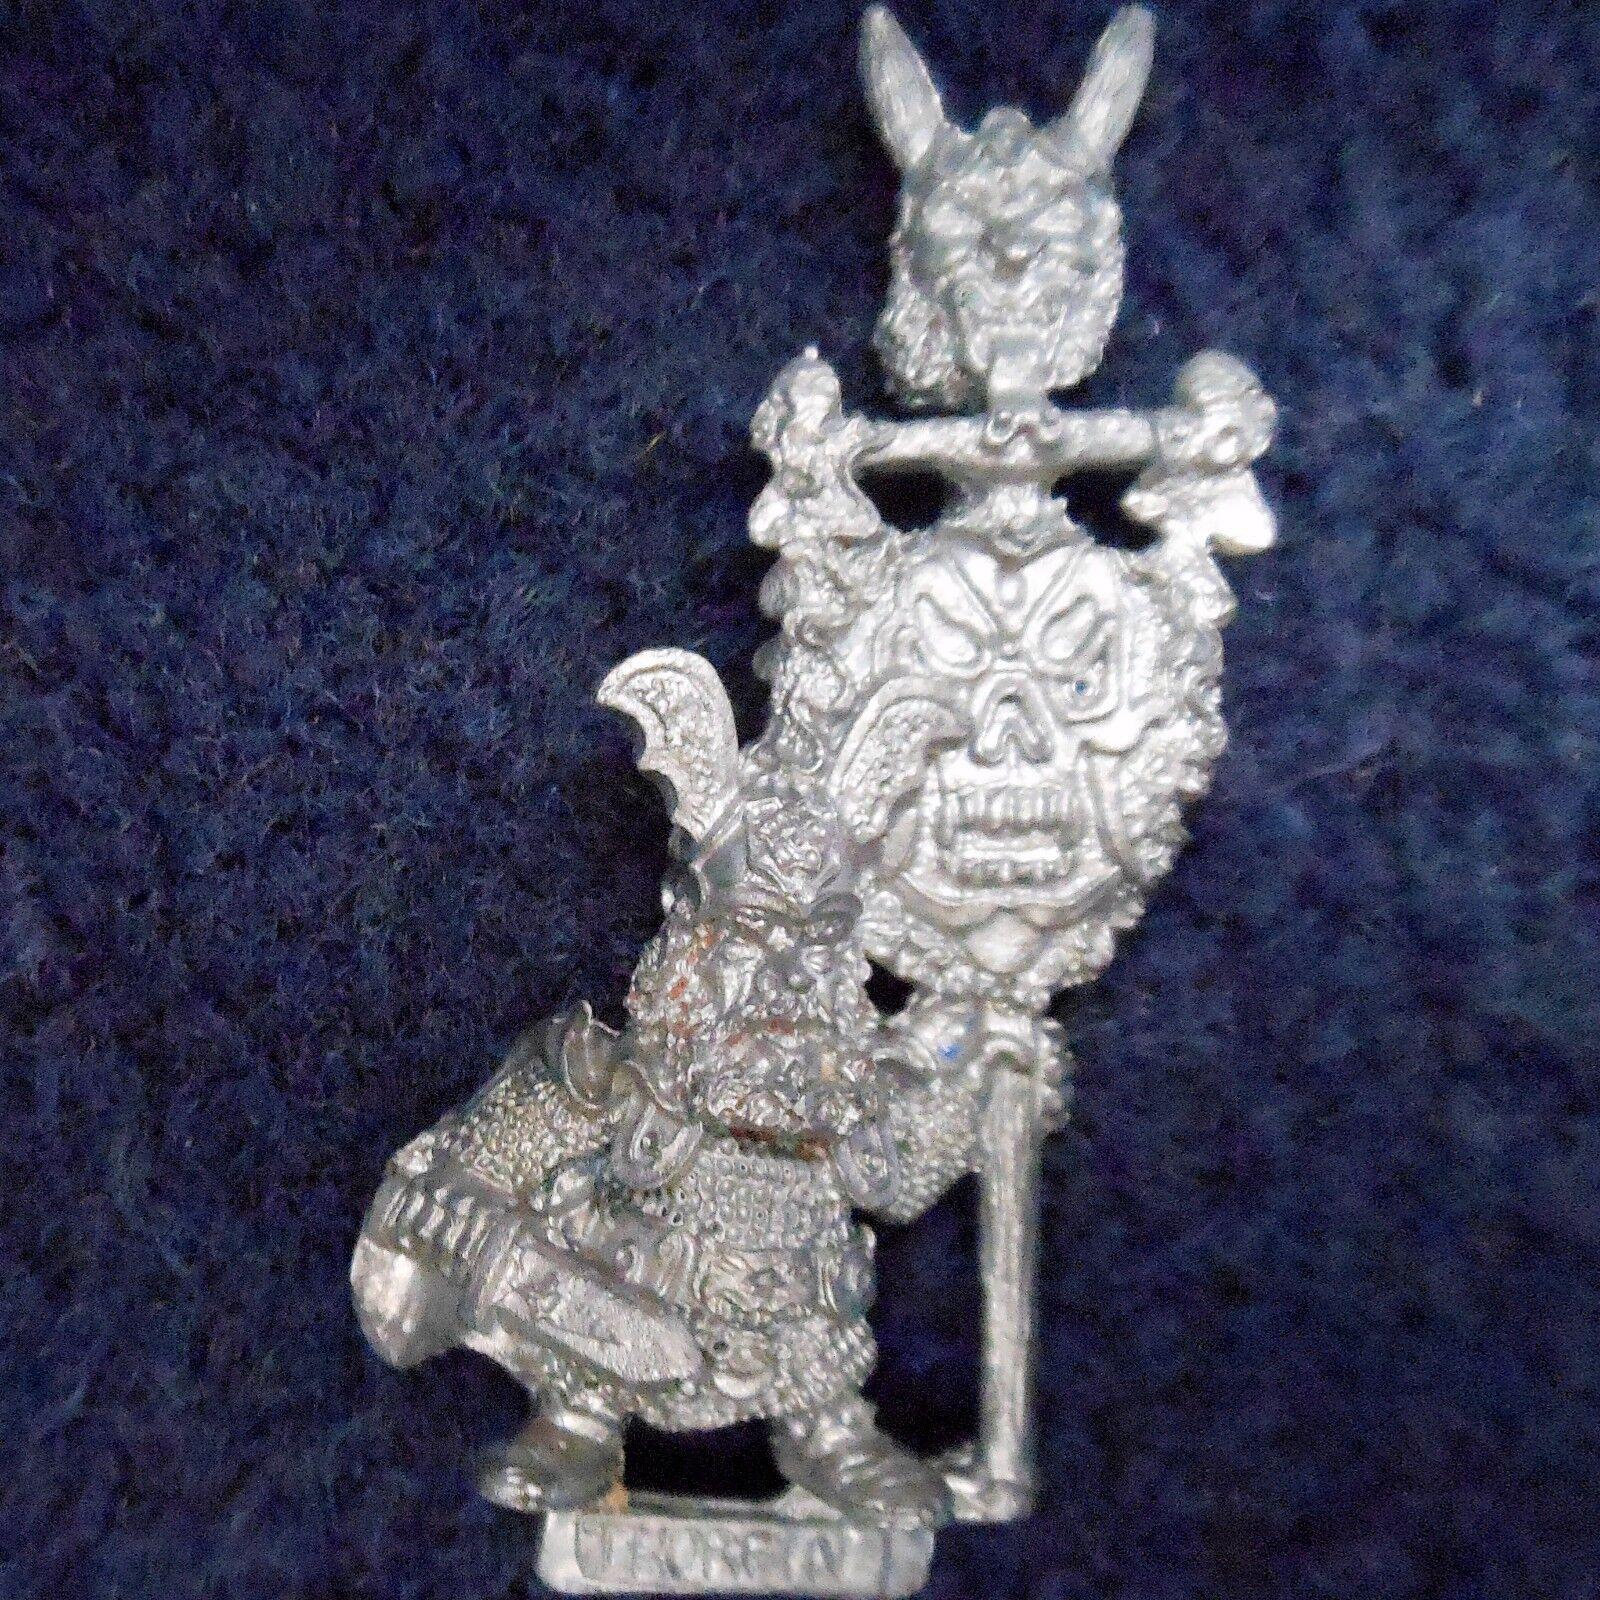 1987 Iron Claw Gothic Dwarf ICD20 Thorfin IC101 Norse Citadel Standard Bearer GW